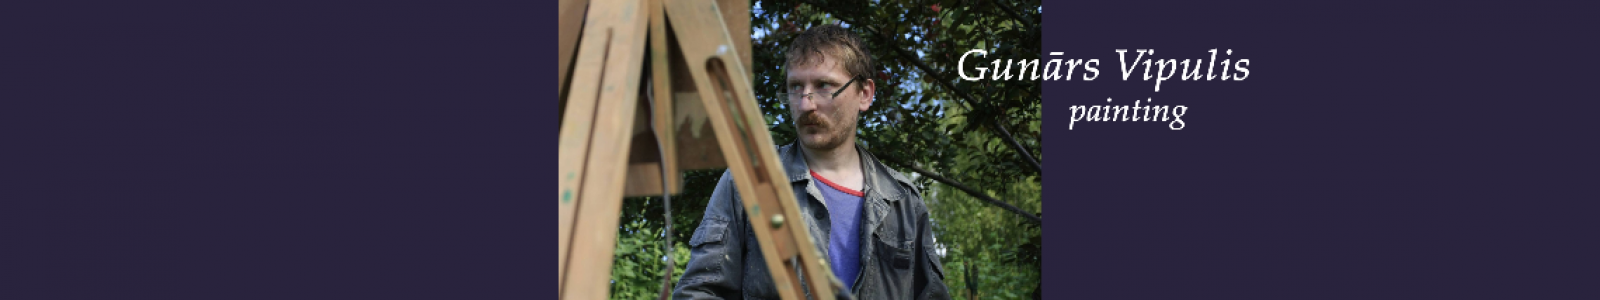 Gallery Painter Gunars Vipulis